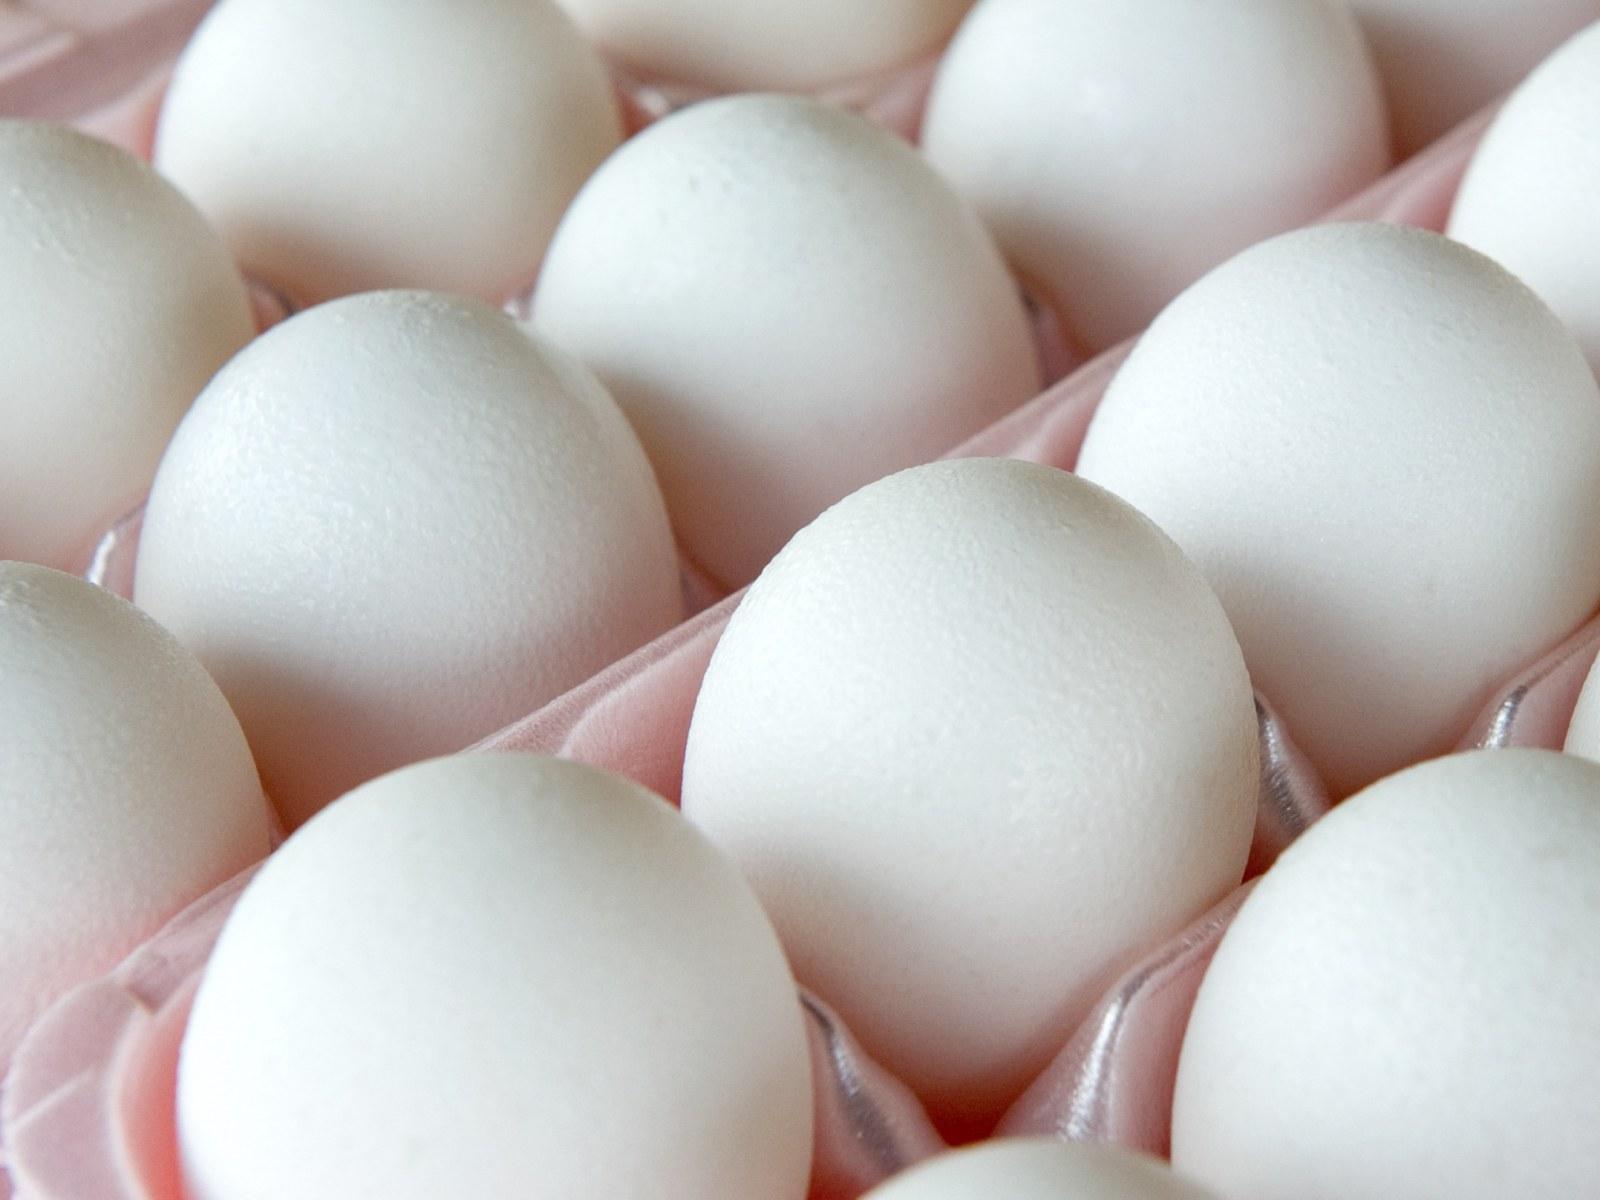 Listeria Concerns Prompt Massive Recall Of Hard Boiled Eggs Potato And Egg Salad Sold At Trader Joe S Walmart